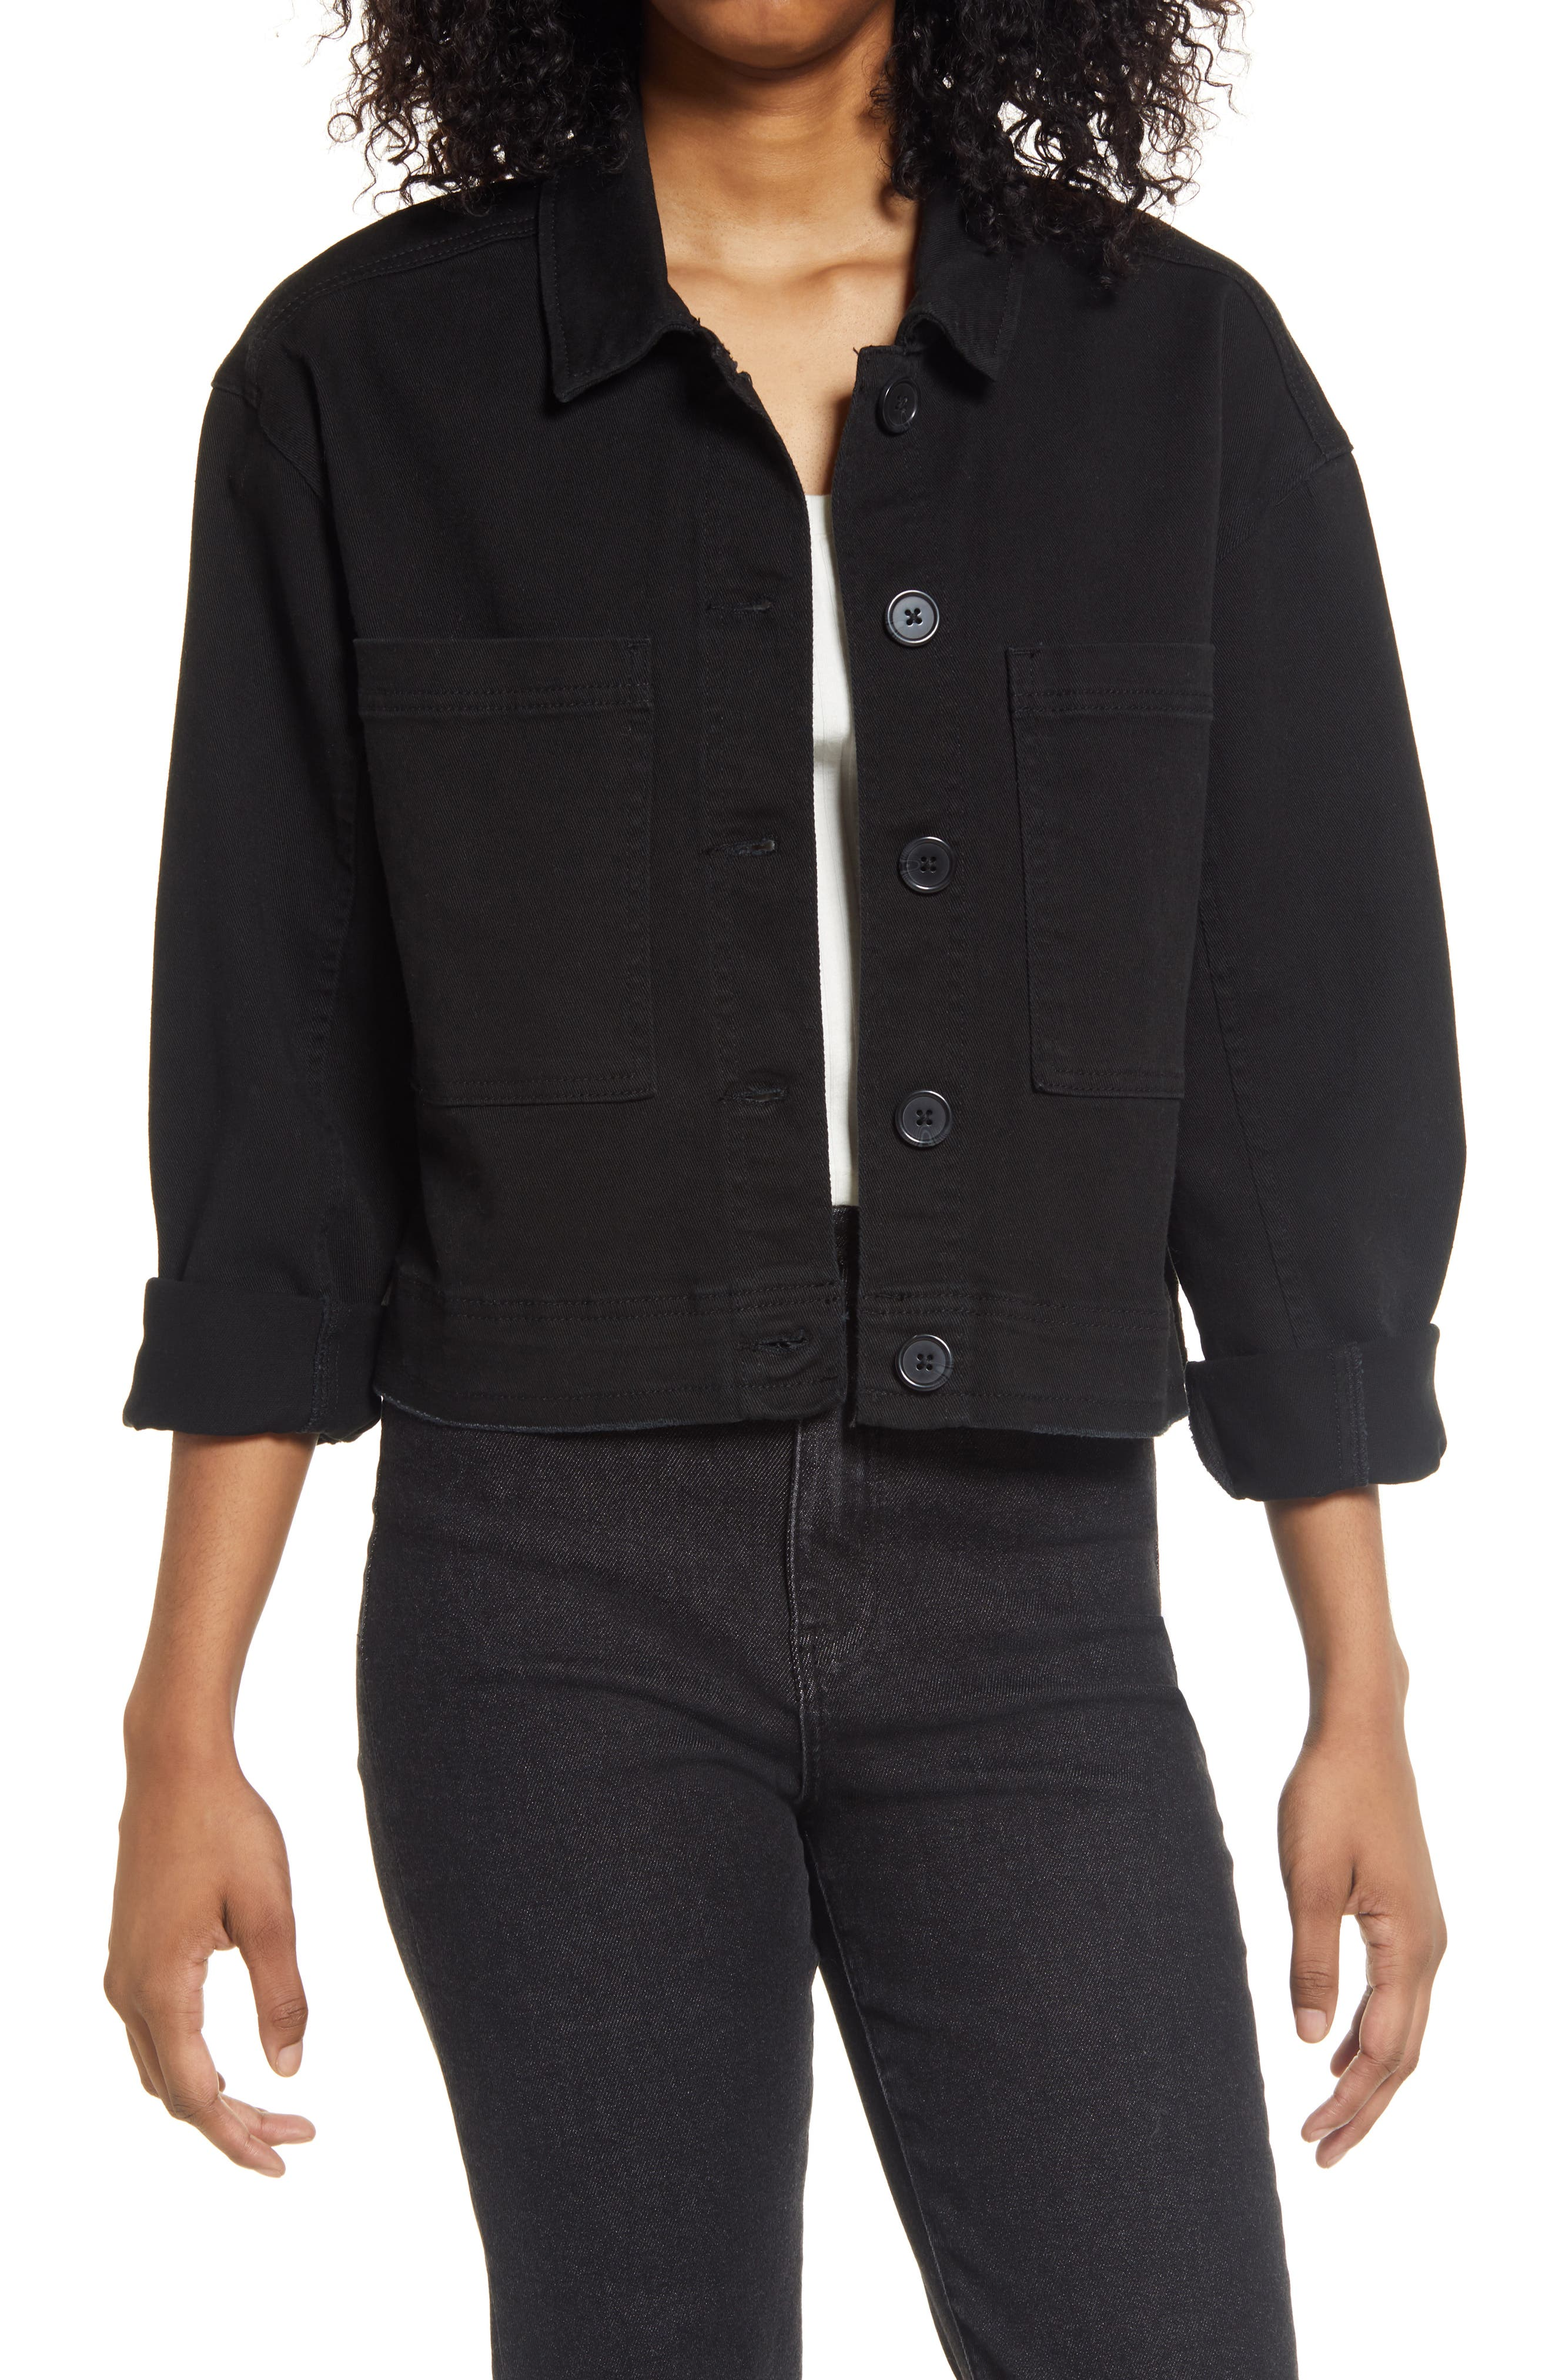 Image of Tinsel Stretch Cotton Workwear Jacket